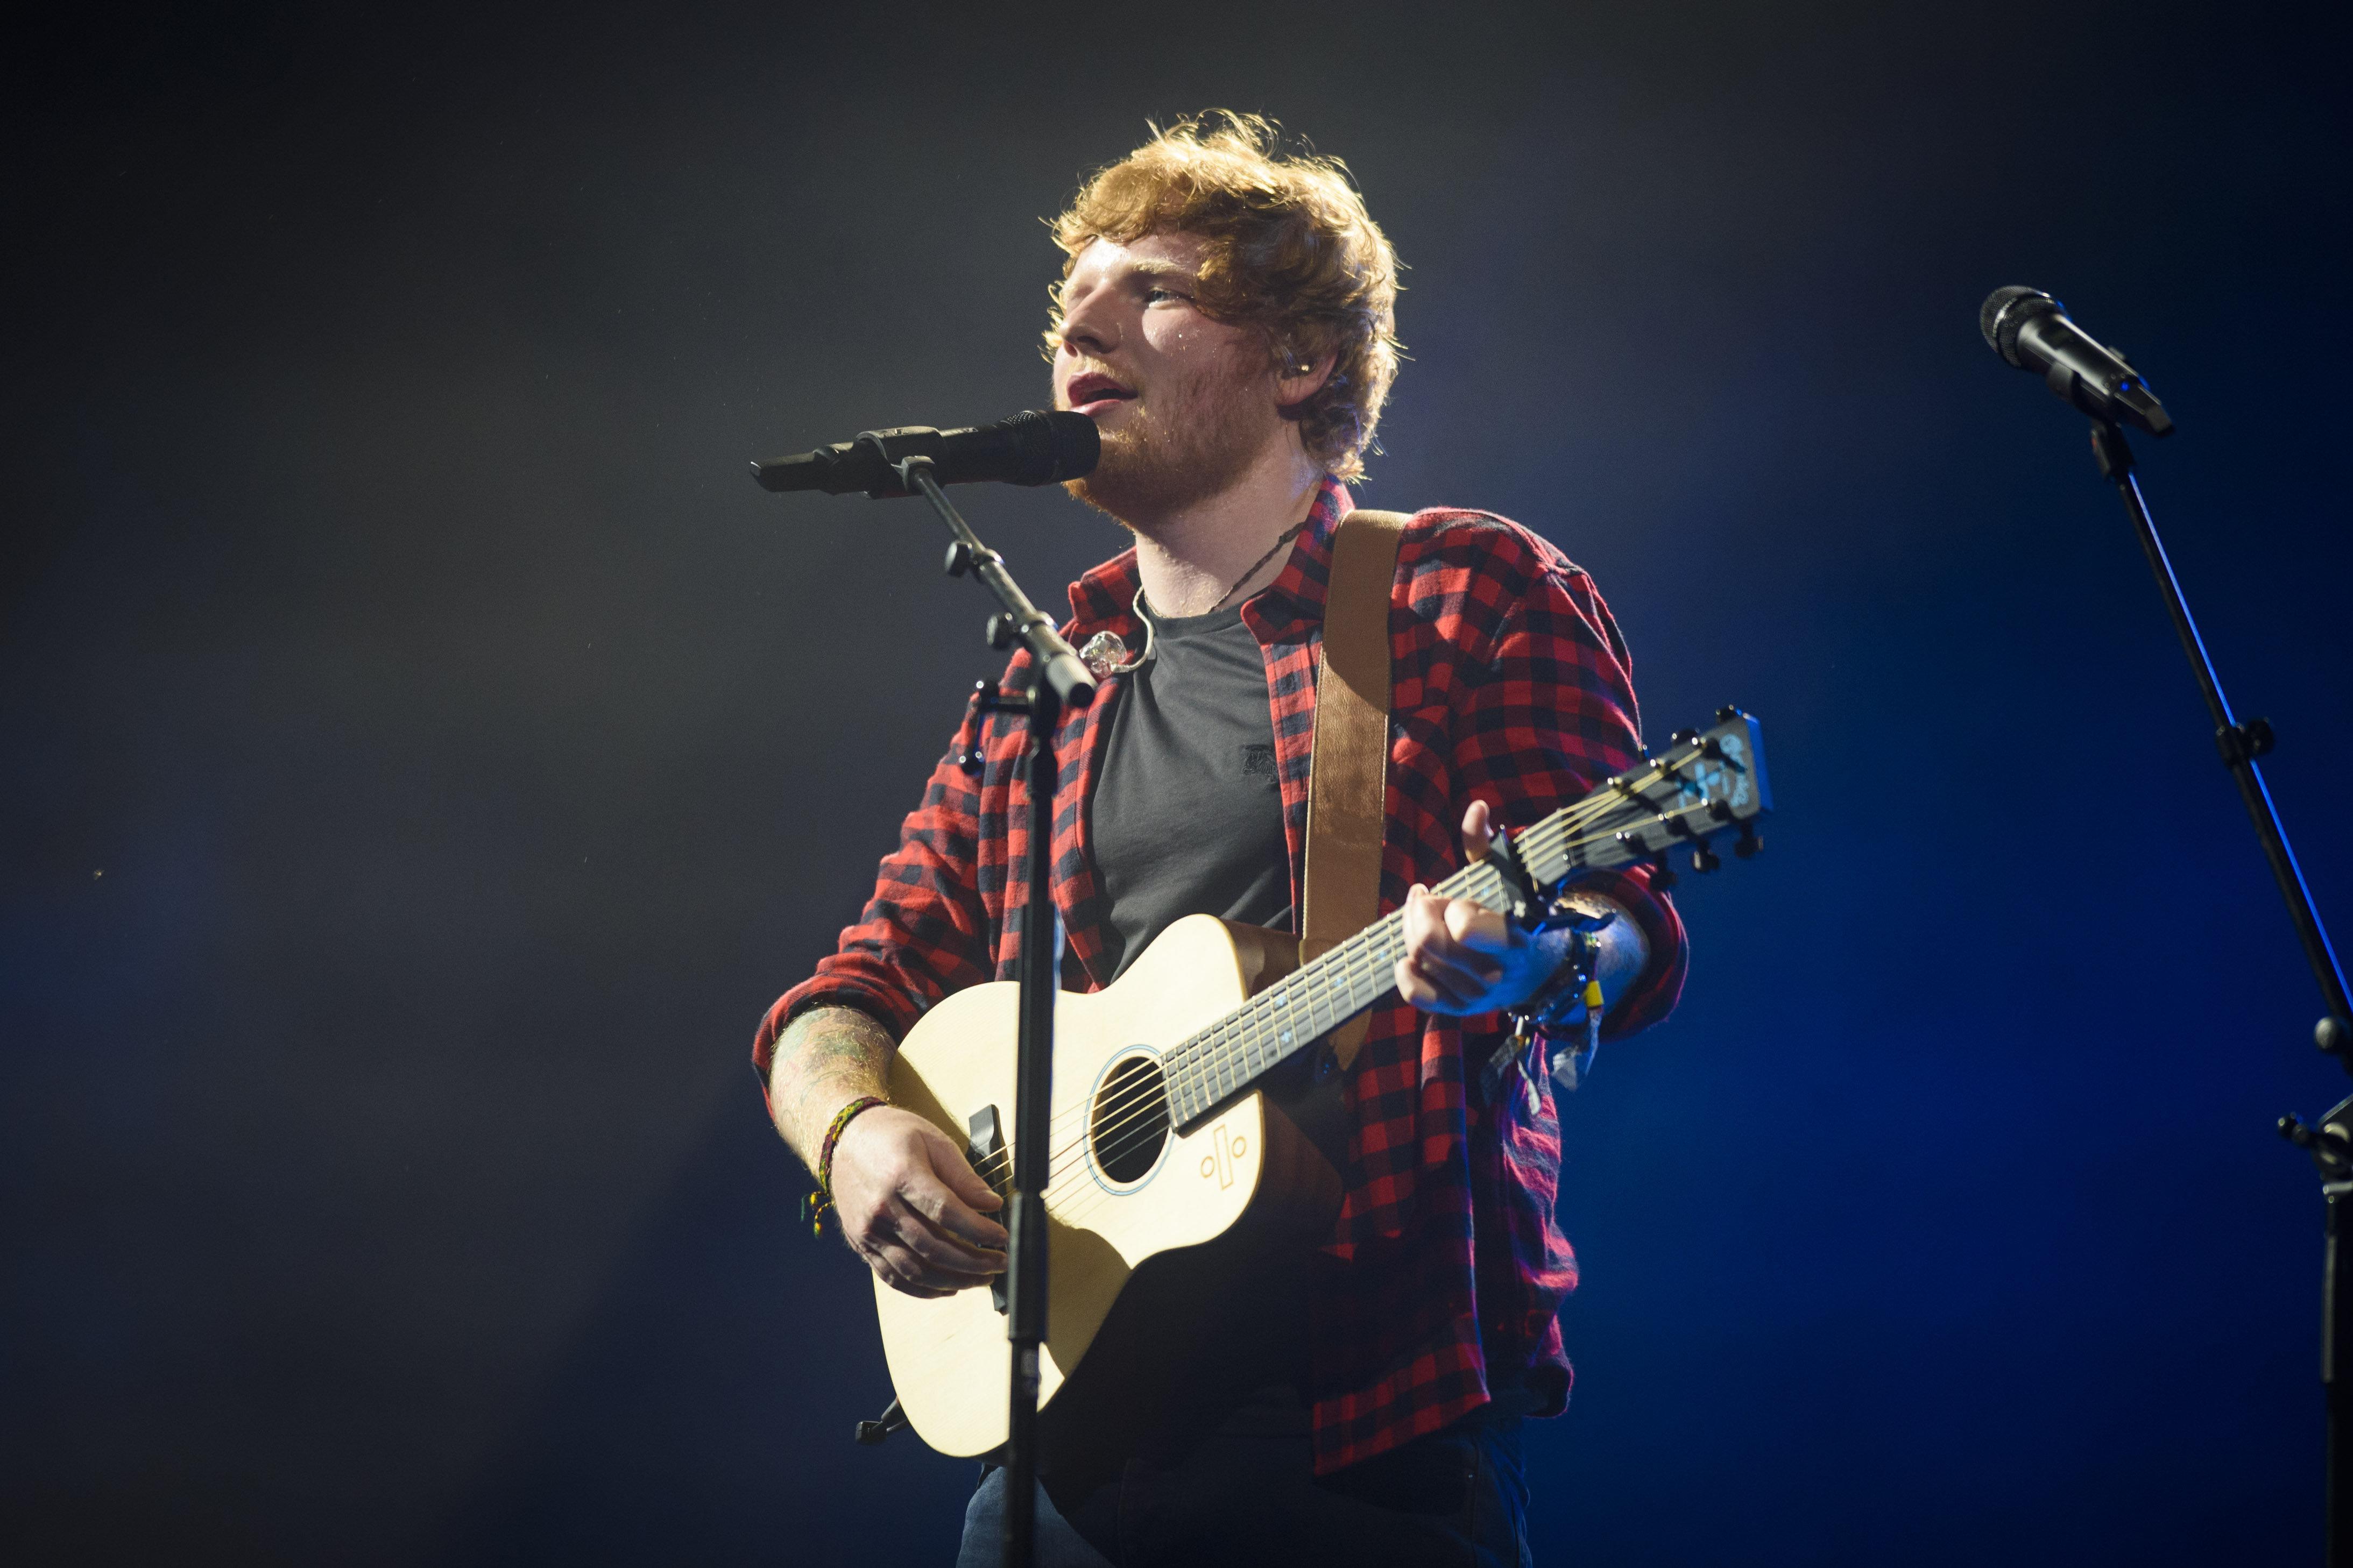 Ed Sheeran played the Pyramid Stage on Sunday